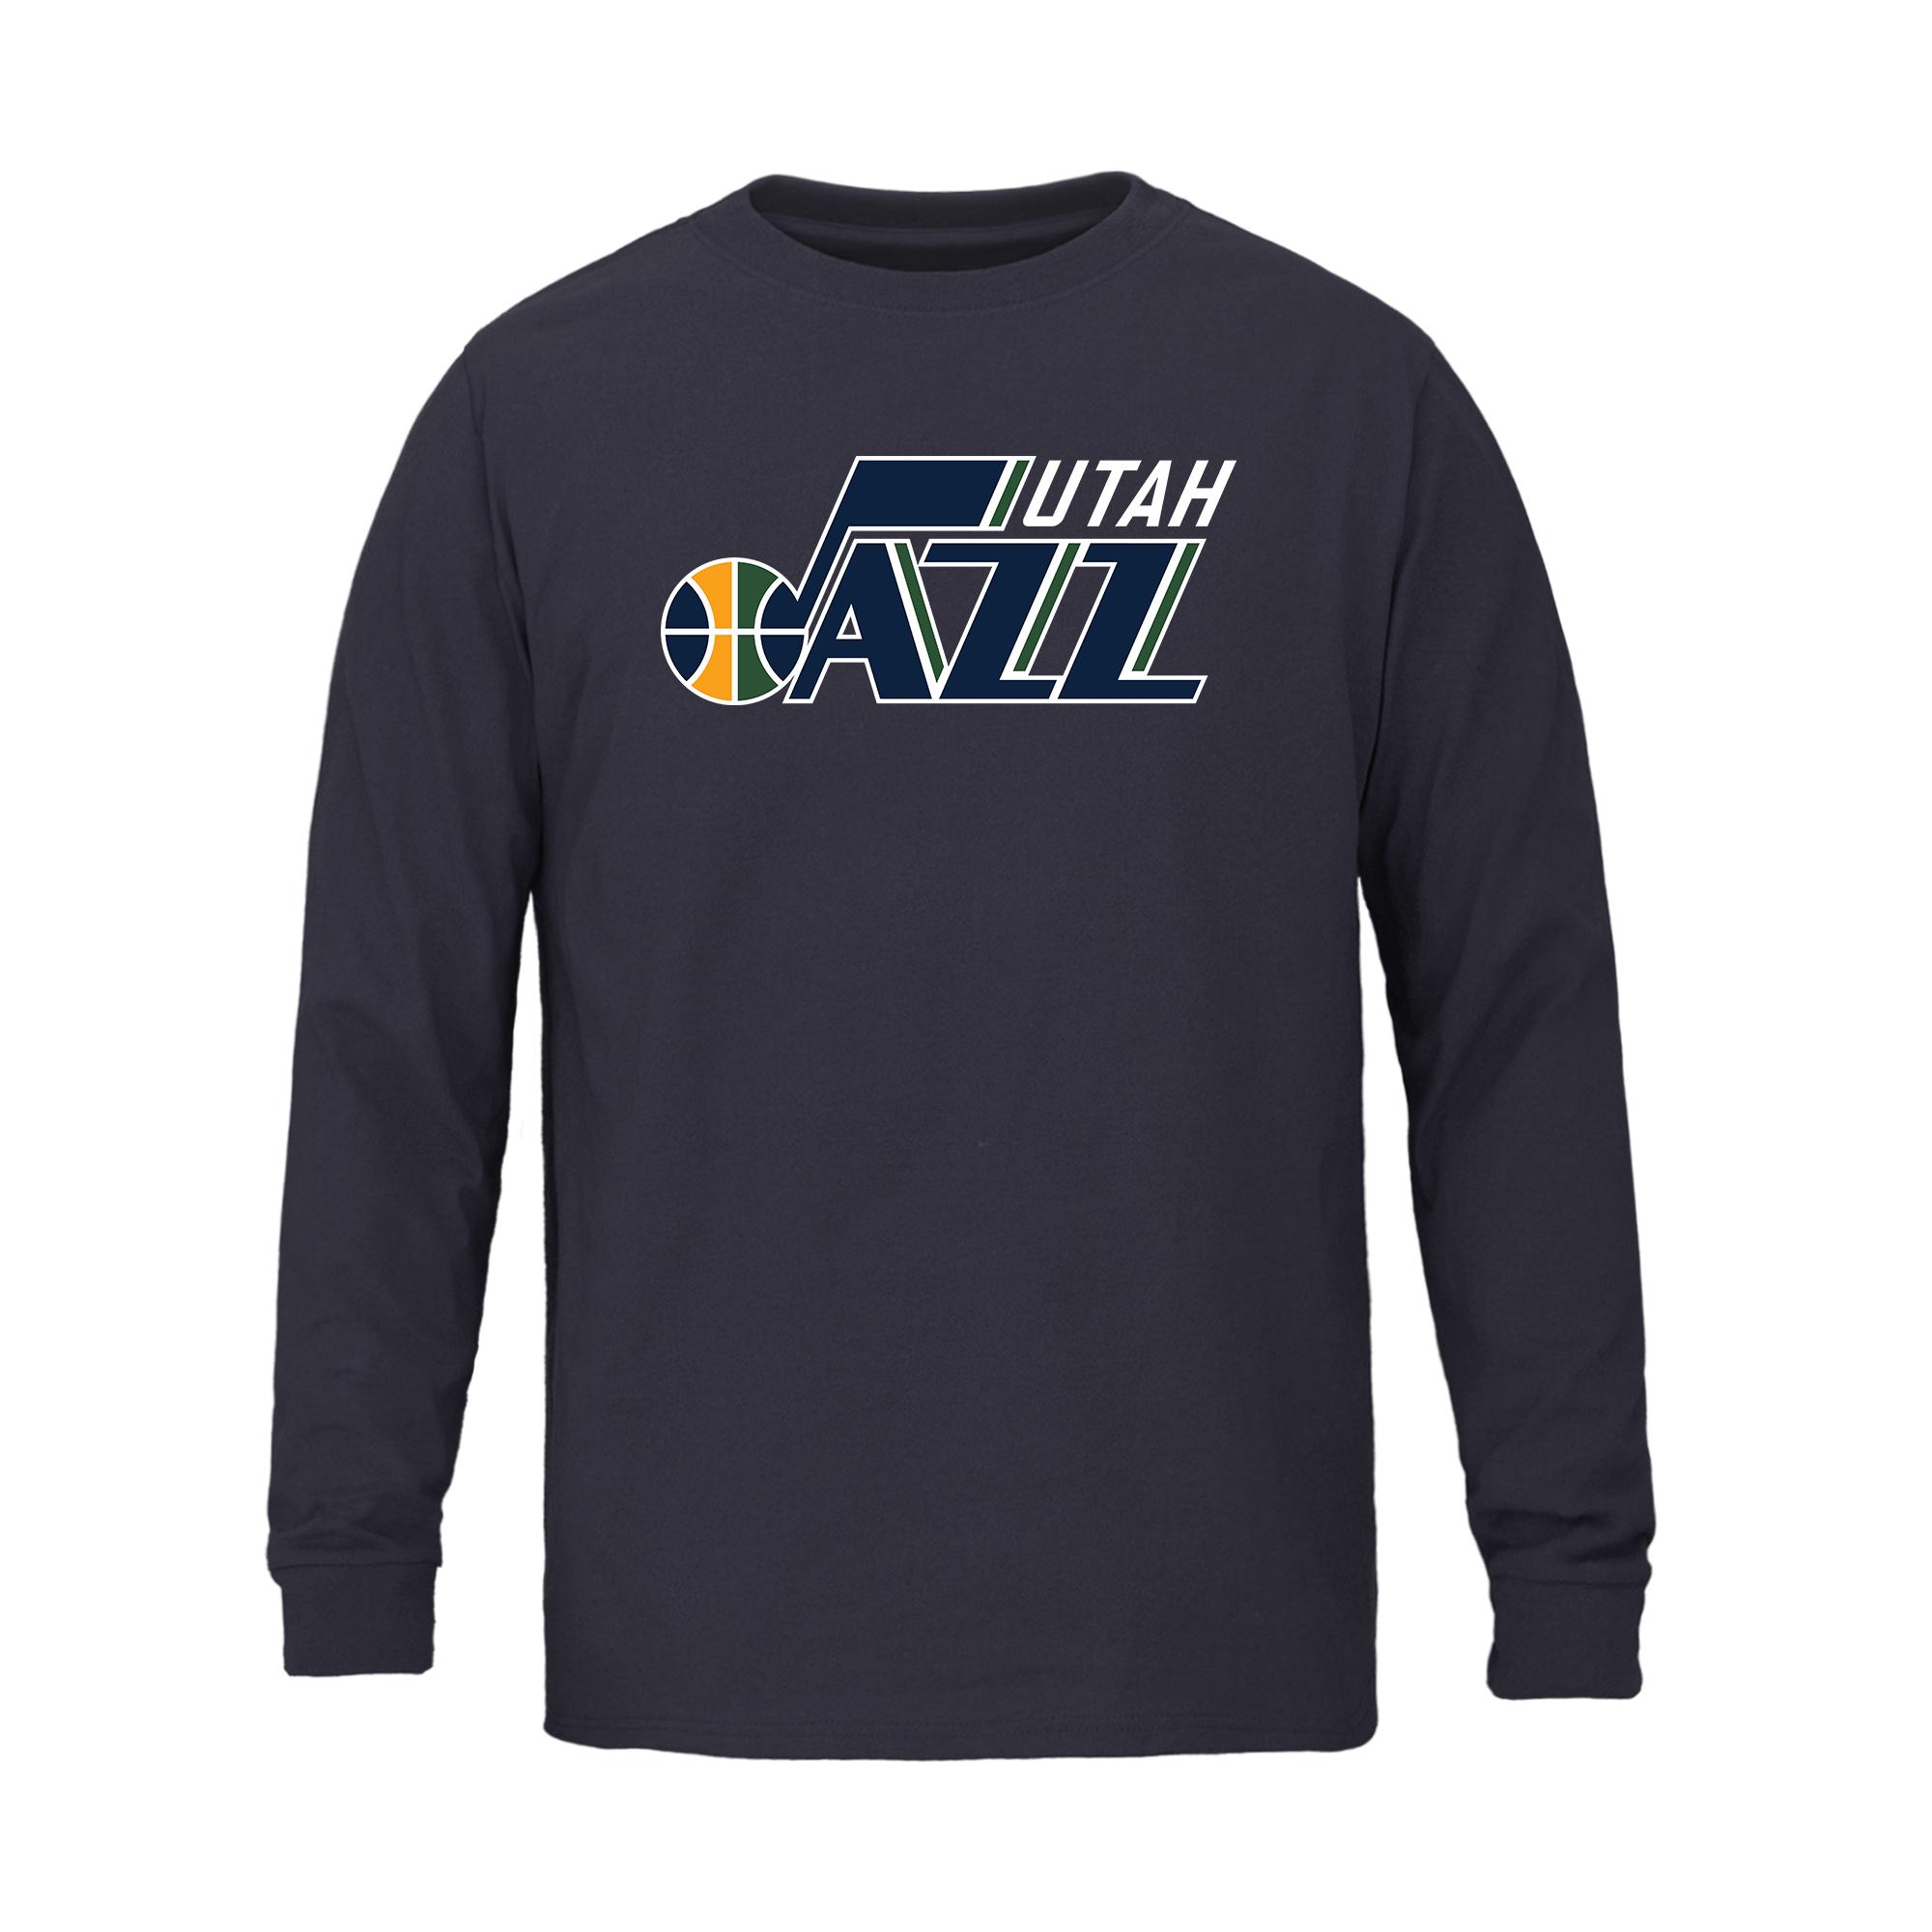 Utah Jazz Fanatics Branded Youth Primary Logo Long Sleeve T-Shirt - Navy